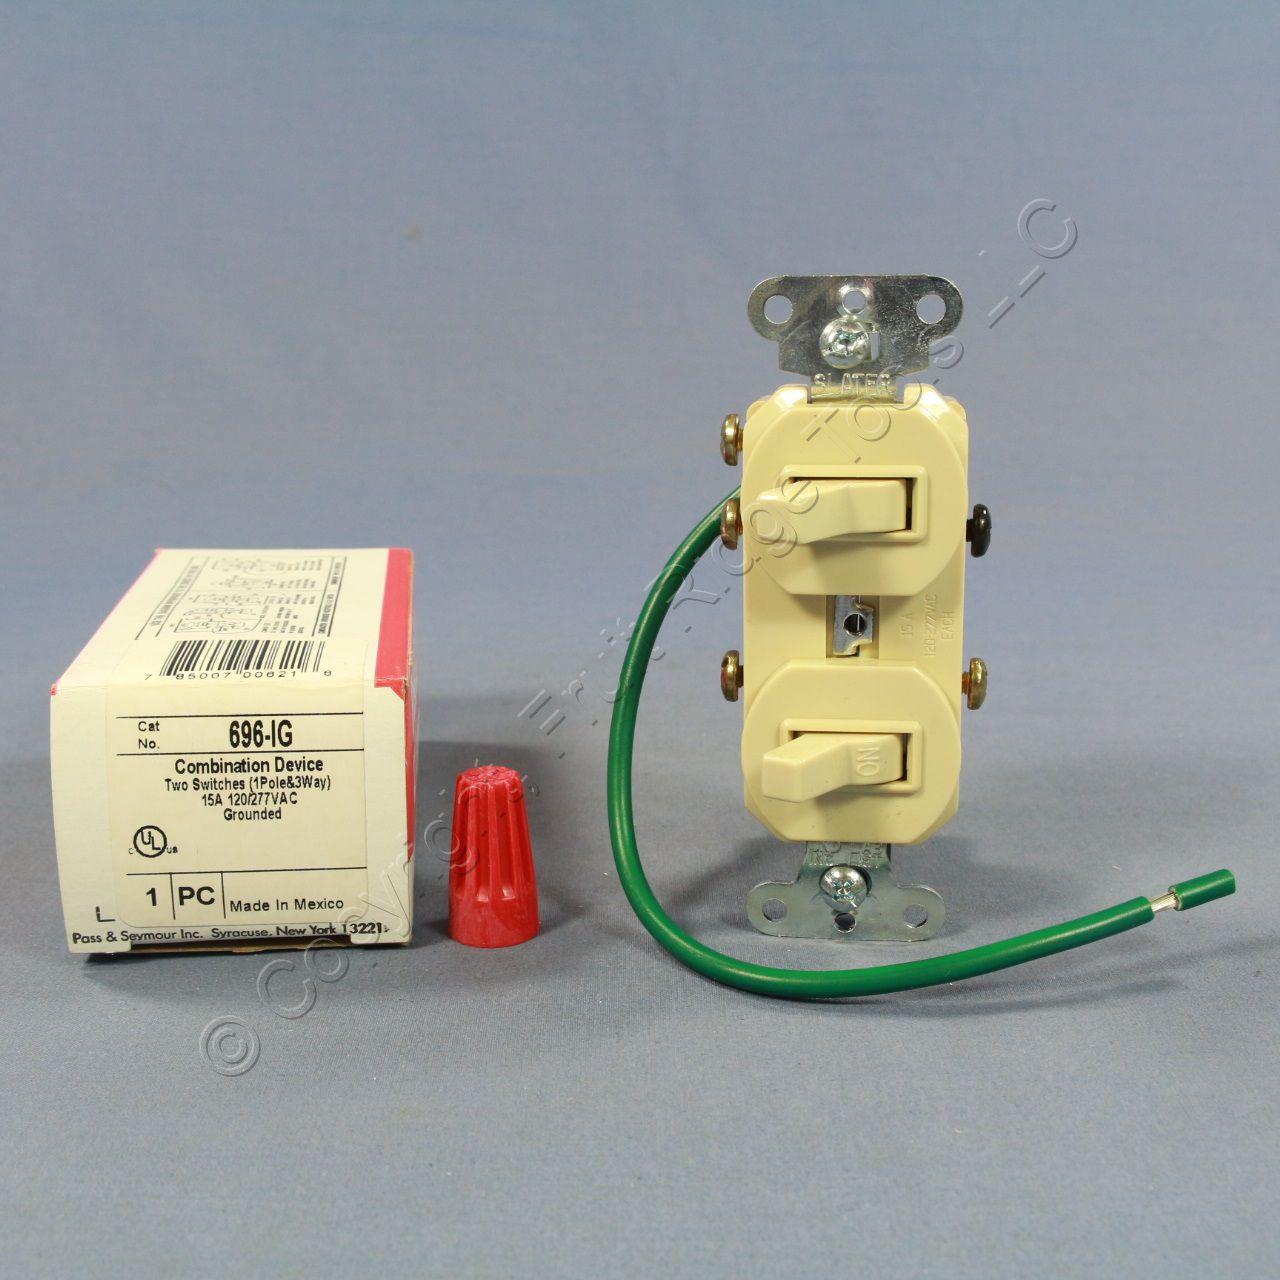 New Ps Ivory Single Pole 3 Way Toggle Wall Light Switch 15a 120 277v 696 Ig